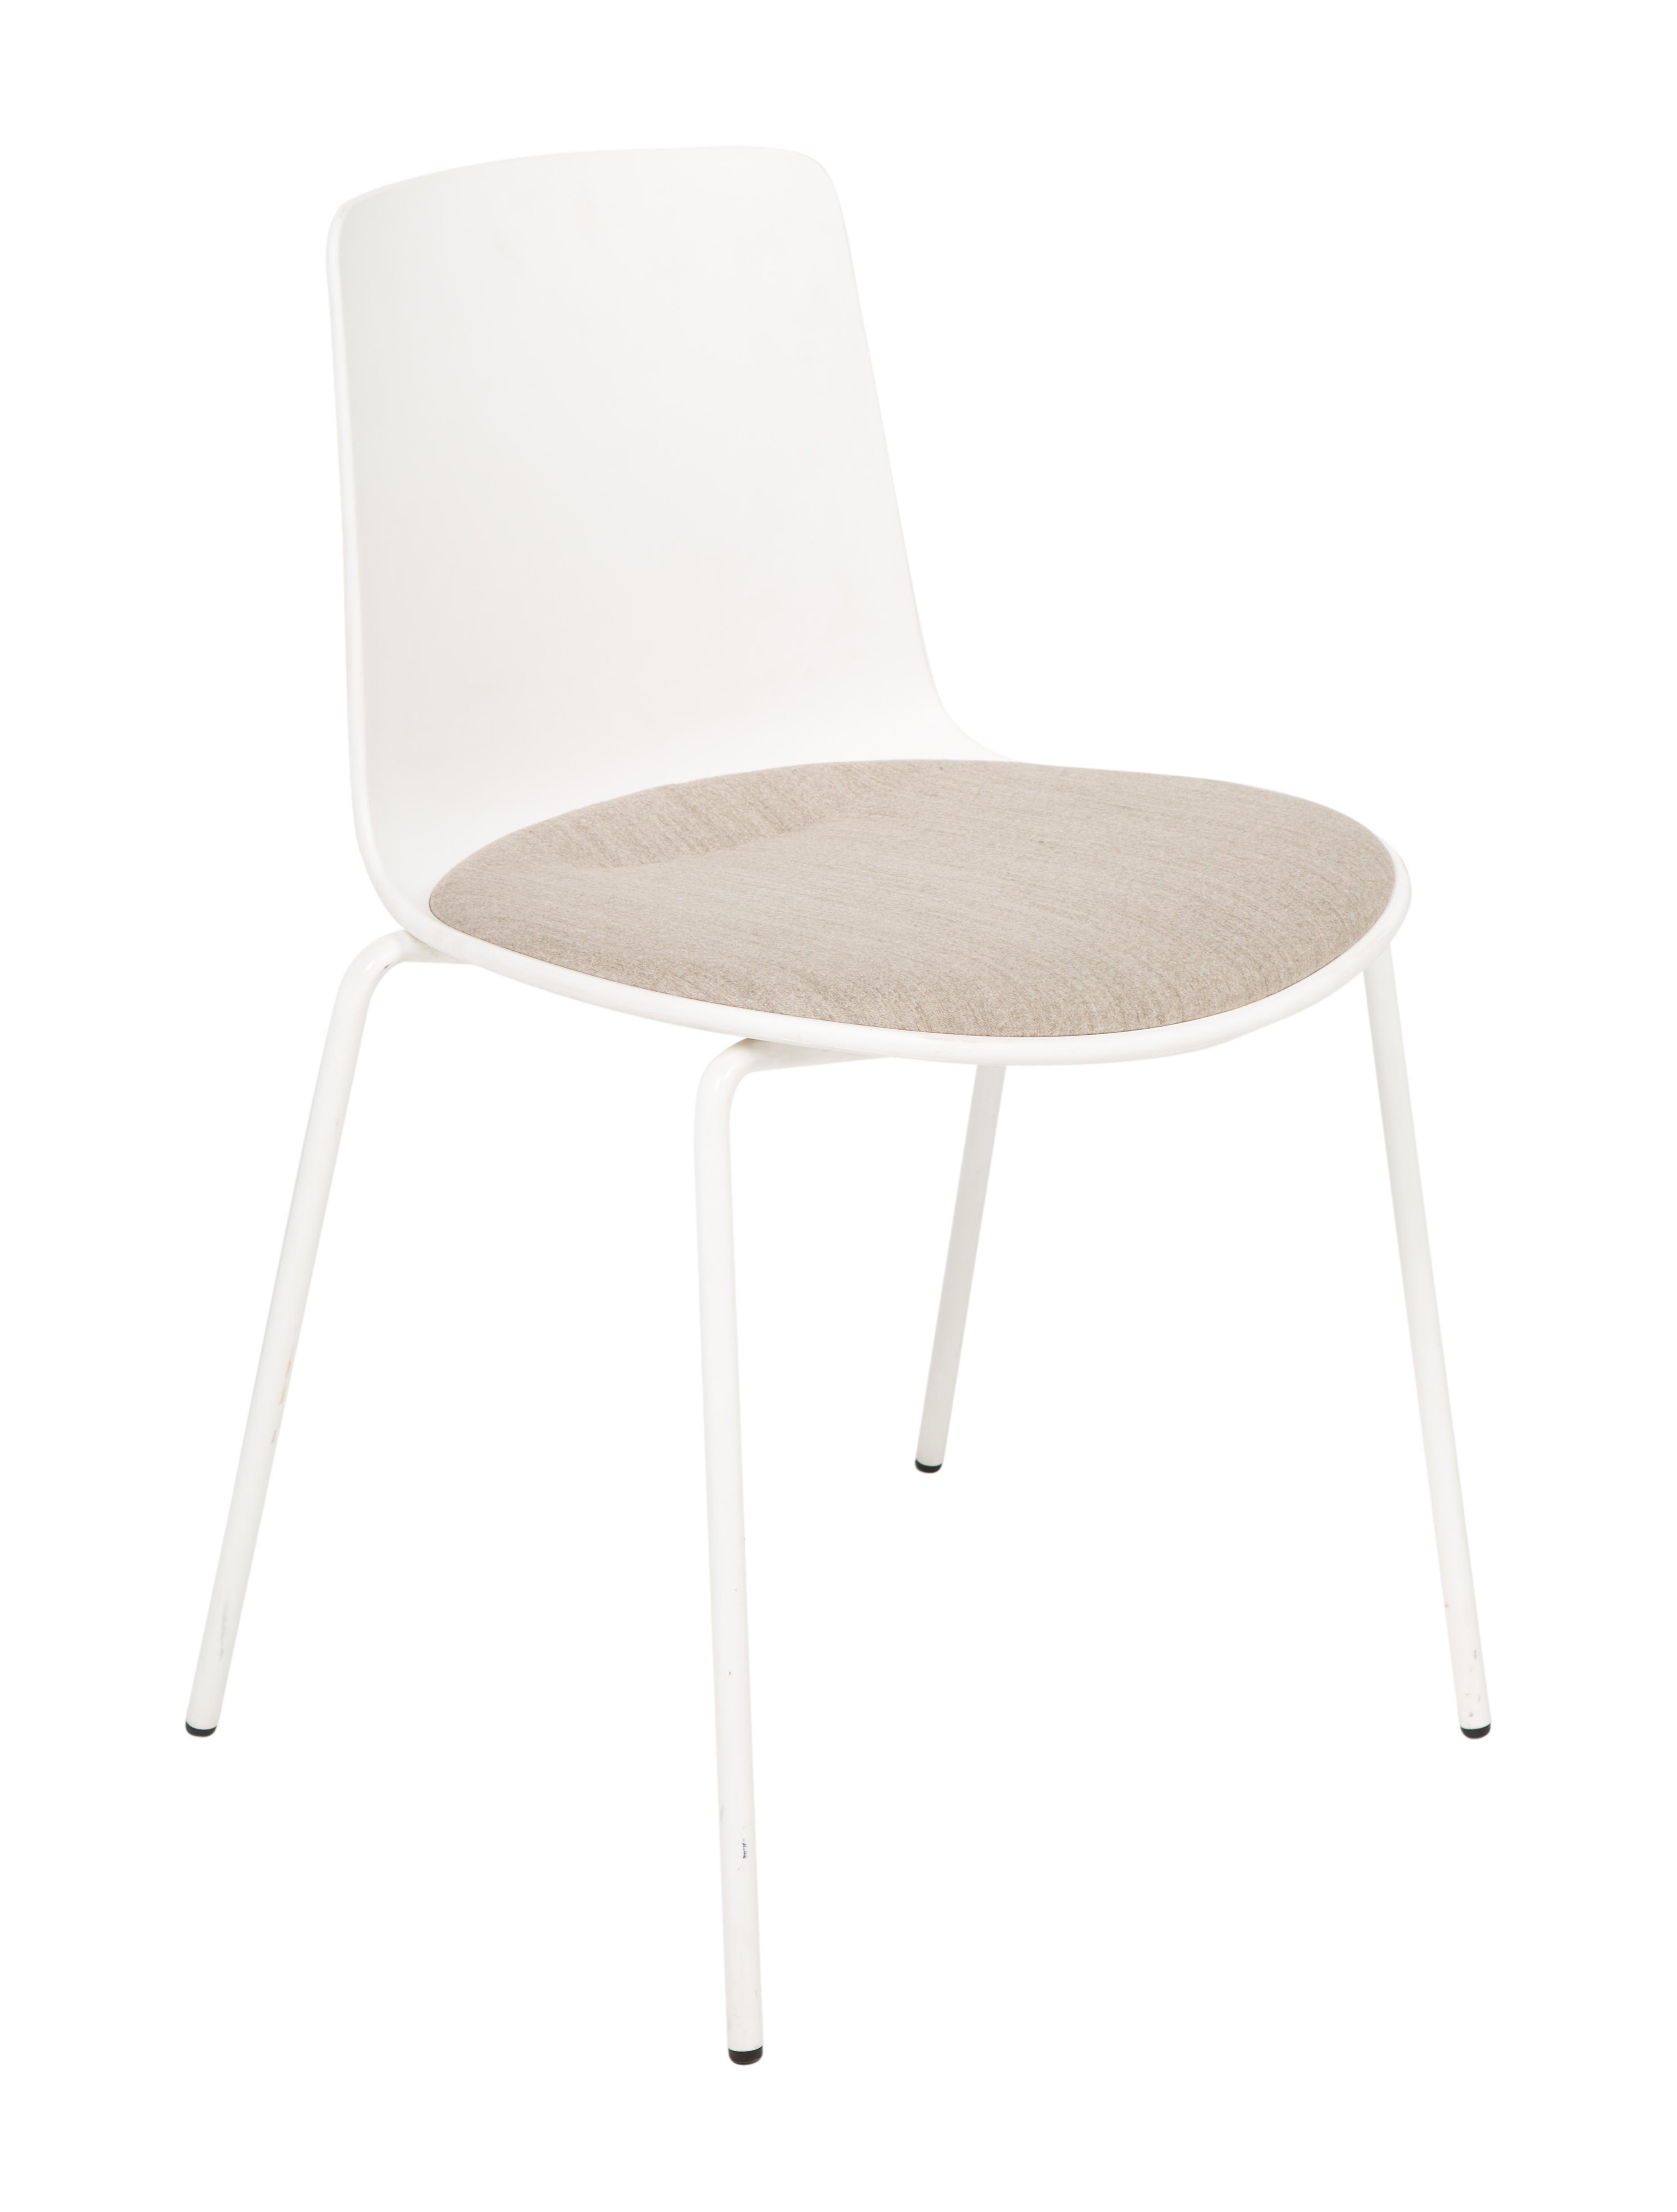 Coalesse Enea Lottus Chair Furniture Coles20003 The